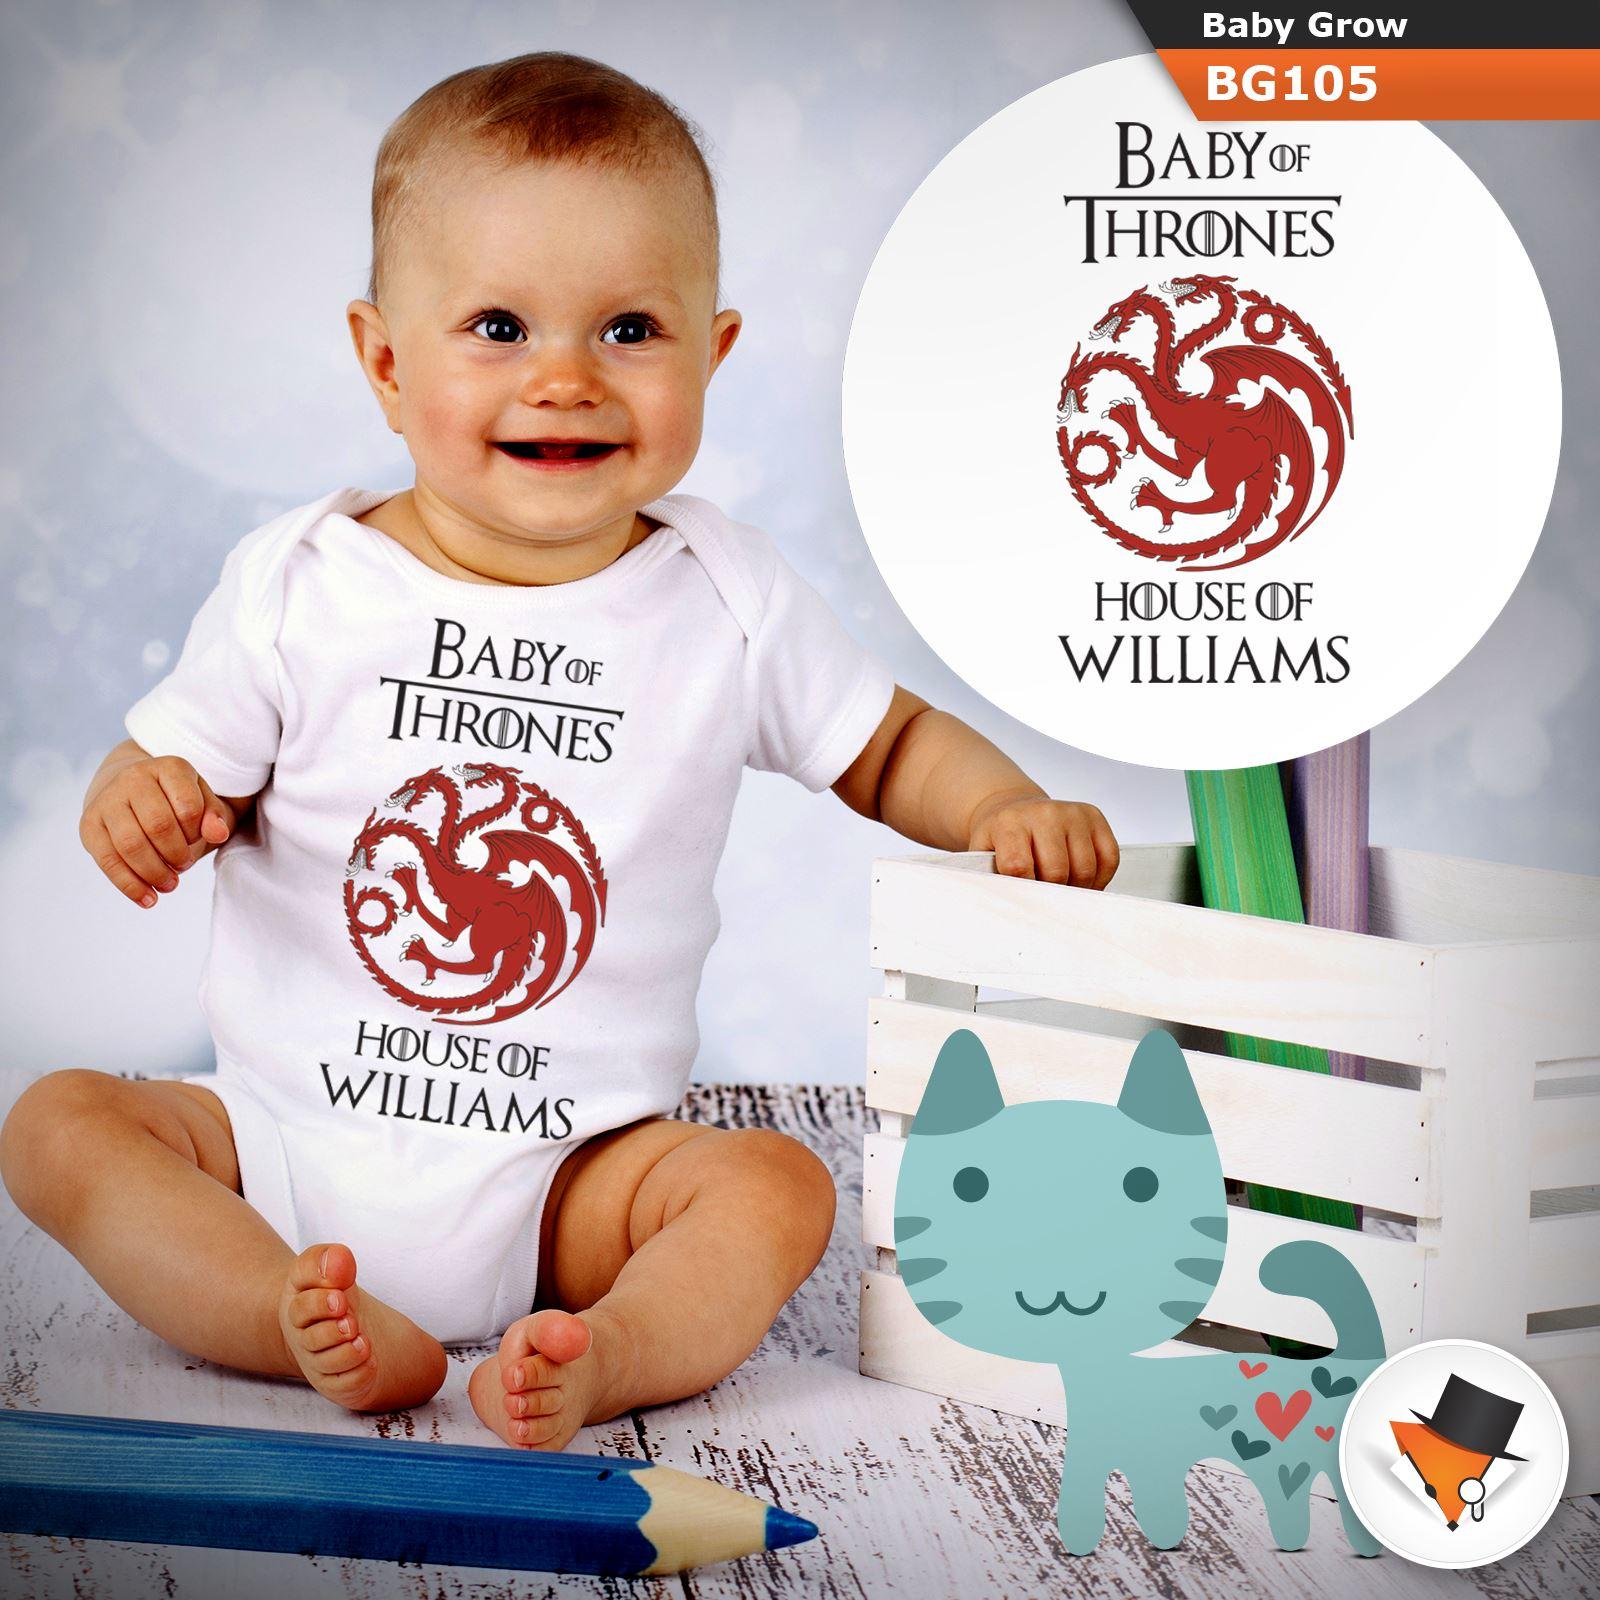 Personnalisée Game of Thrones Stark Babygrow Baby Grow Toutes Tailles